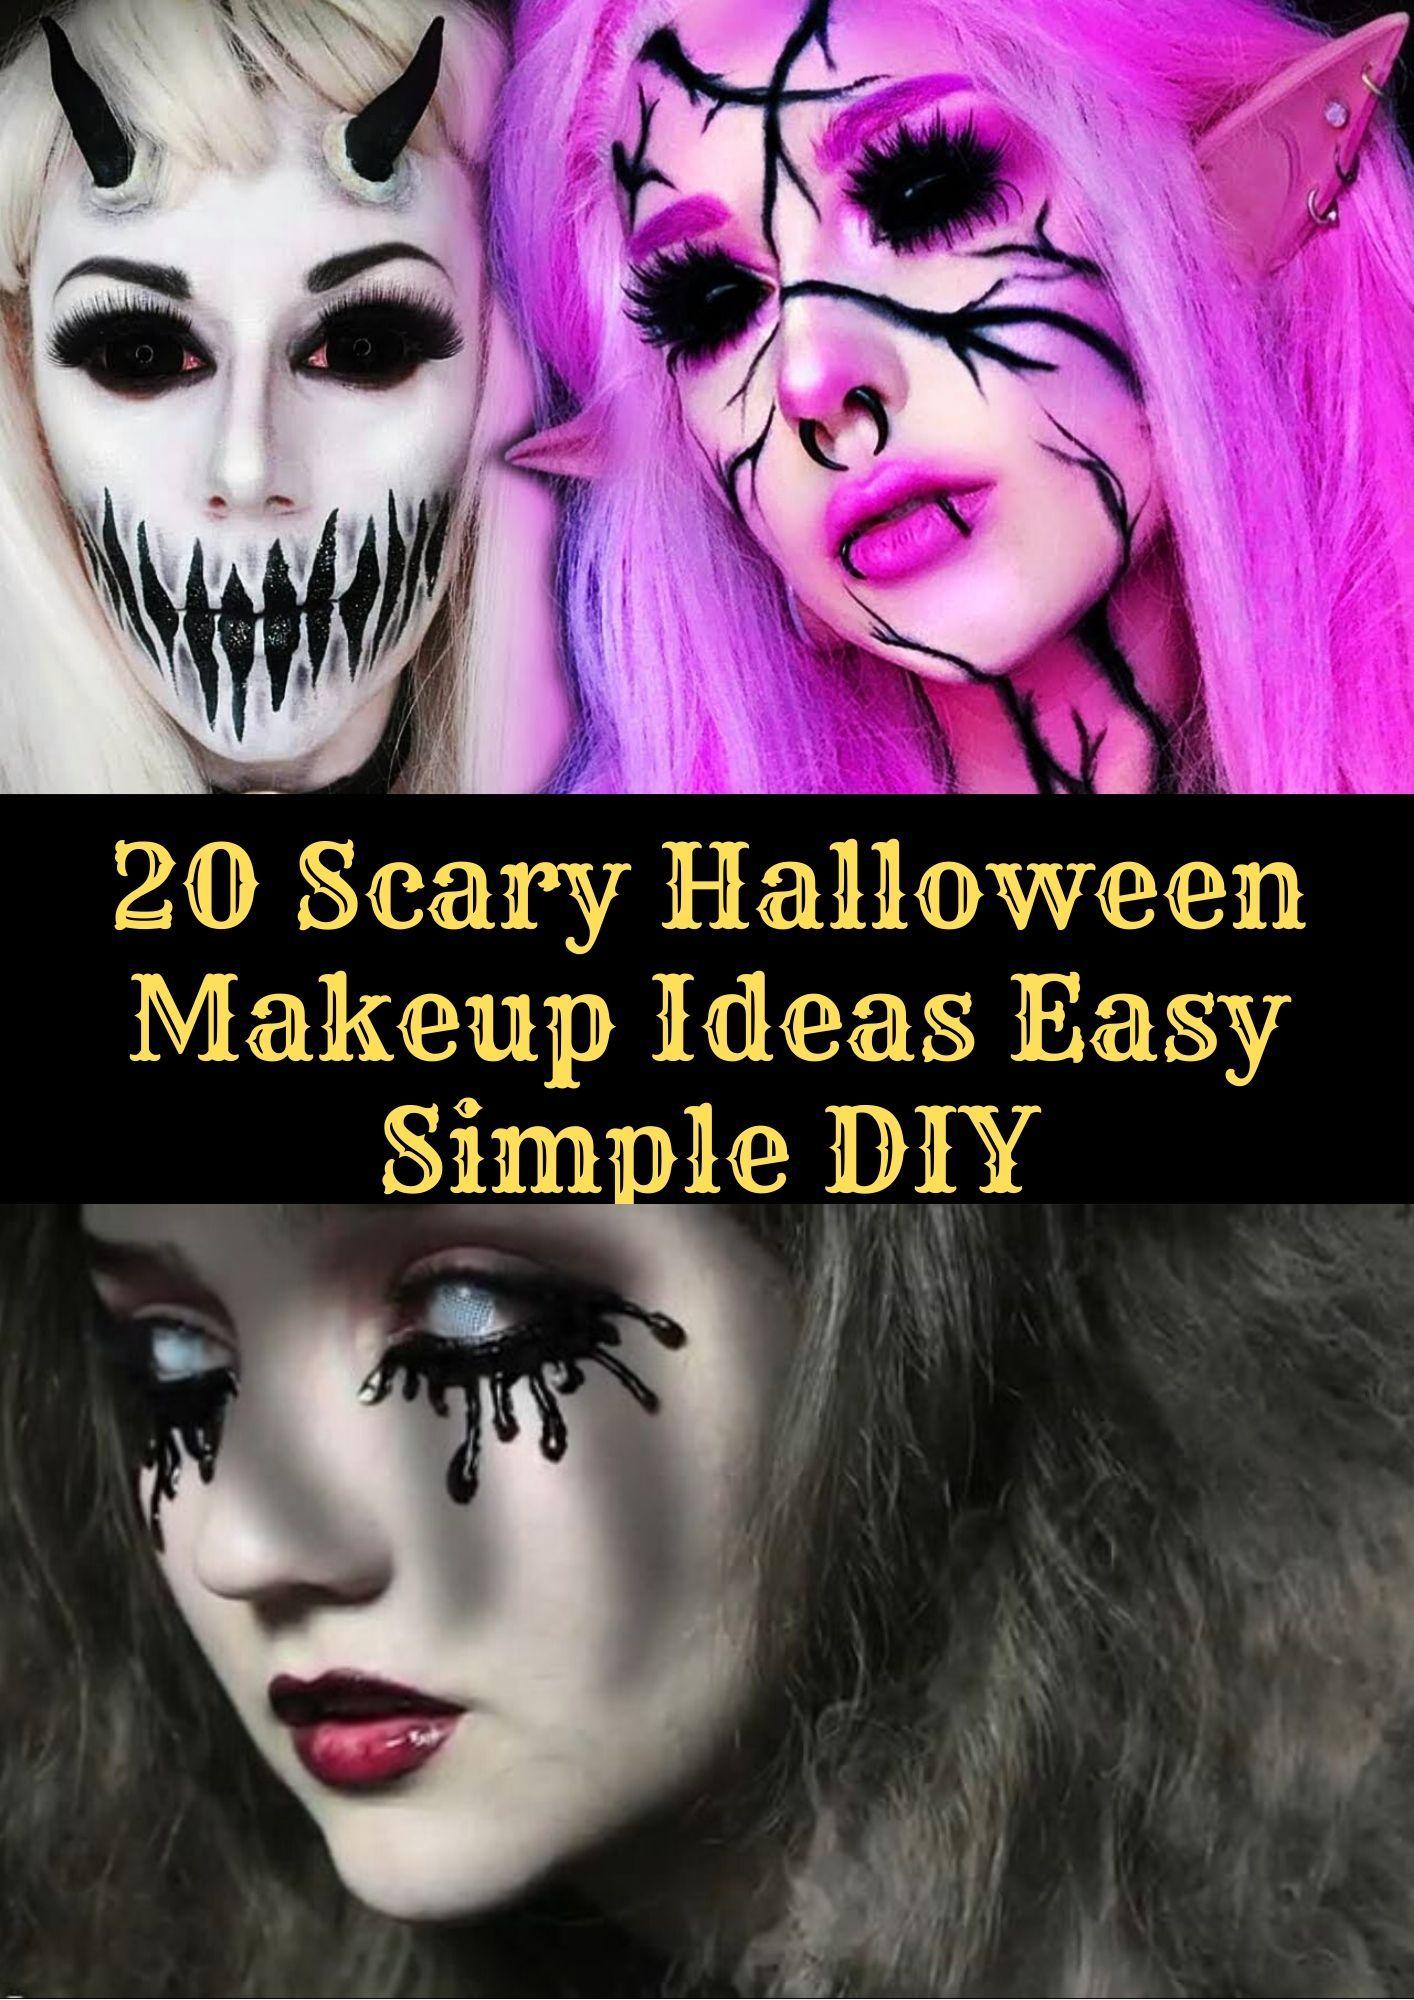 27 Scary Halloween Makeup Ideas Easy Simple DIY in 2727